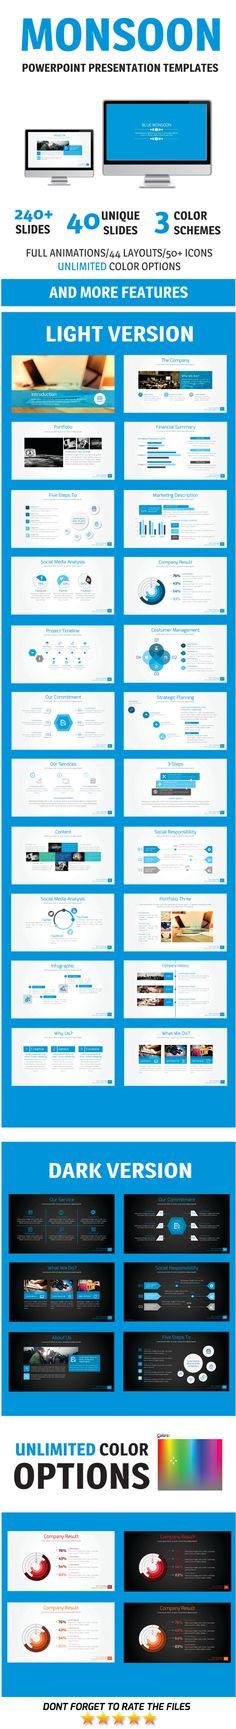 Business Presentation Volume 14 Business powerpoint templates - business presentation